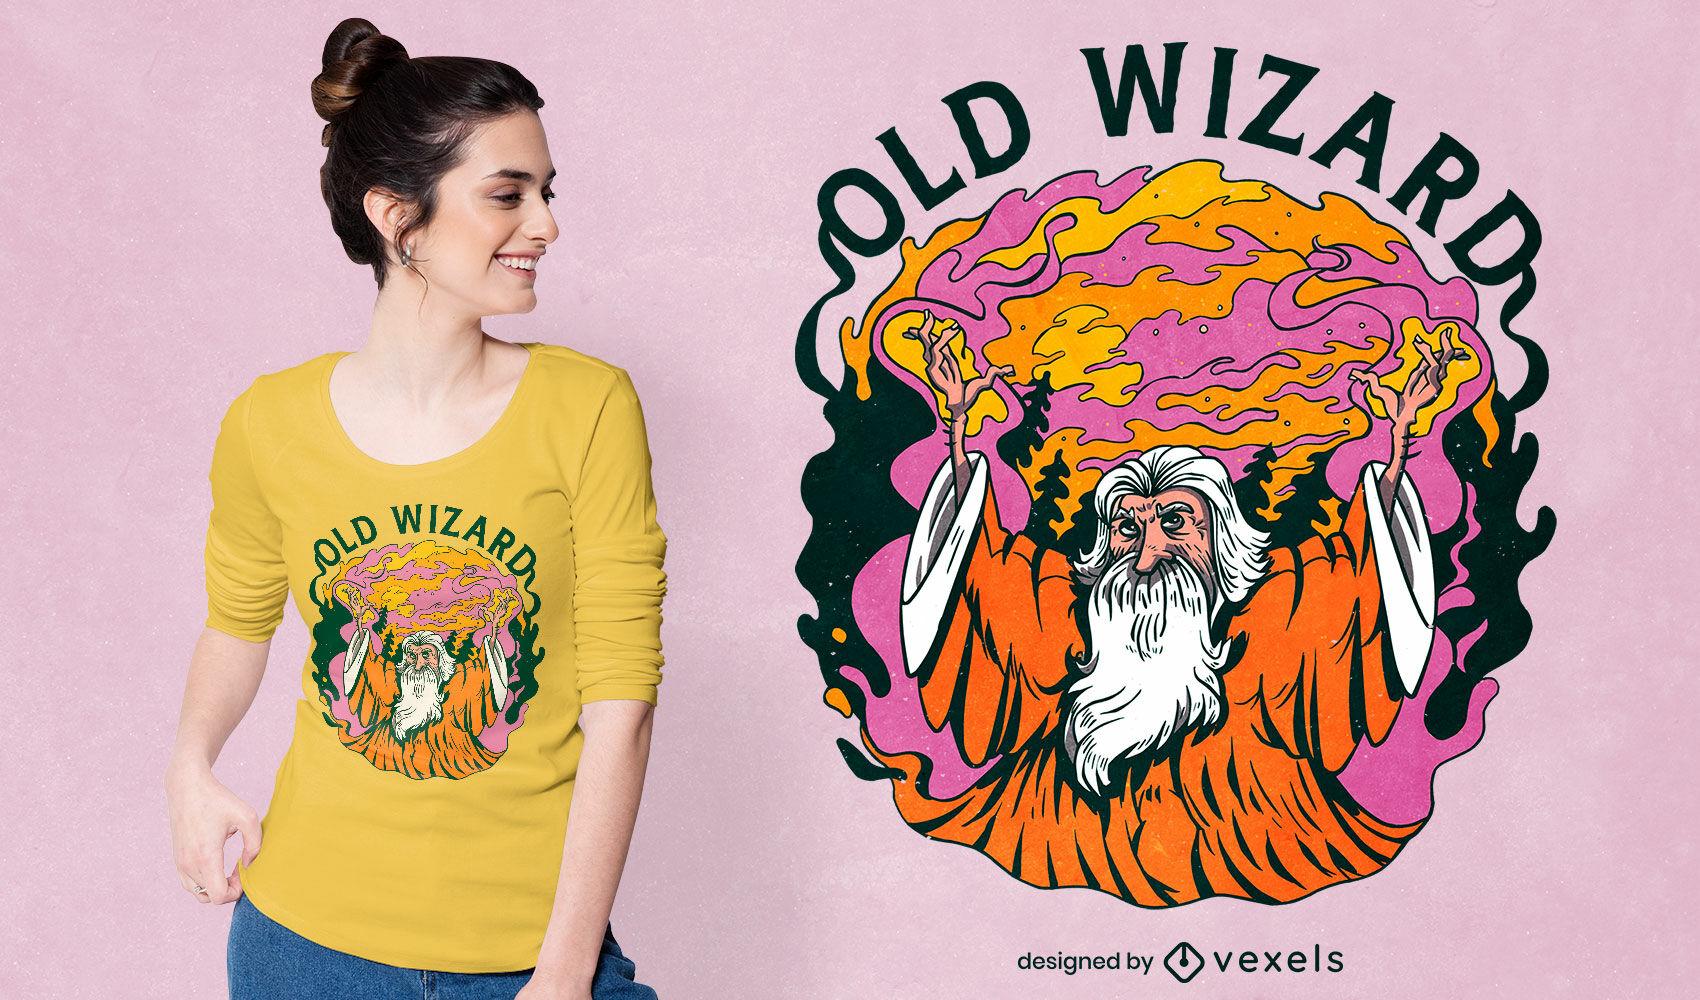 Old wizard magic character t-shirt design